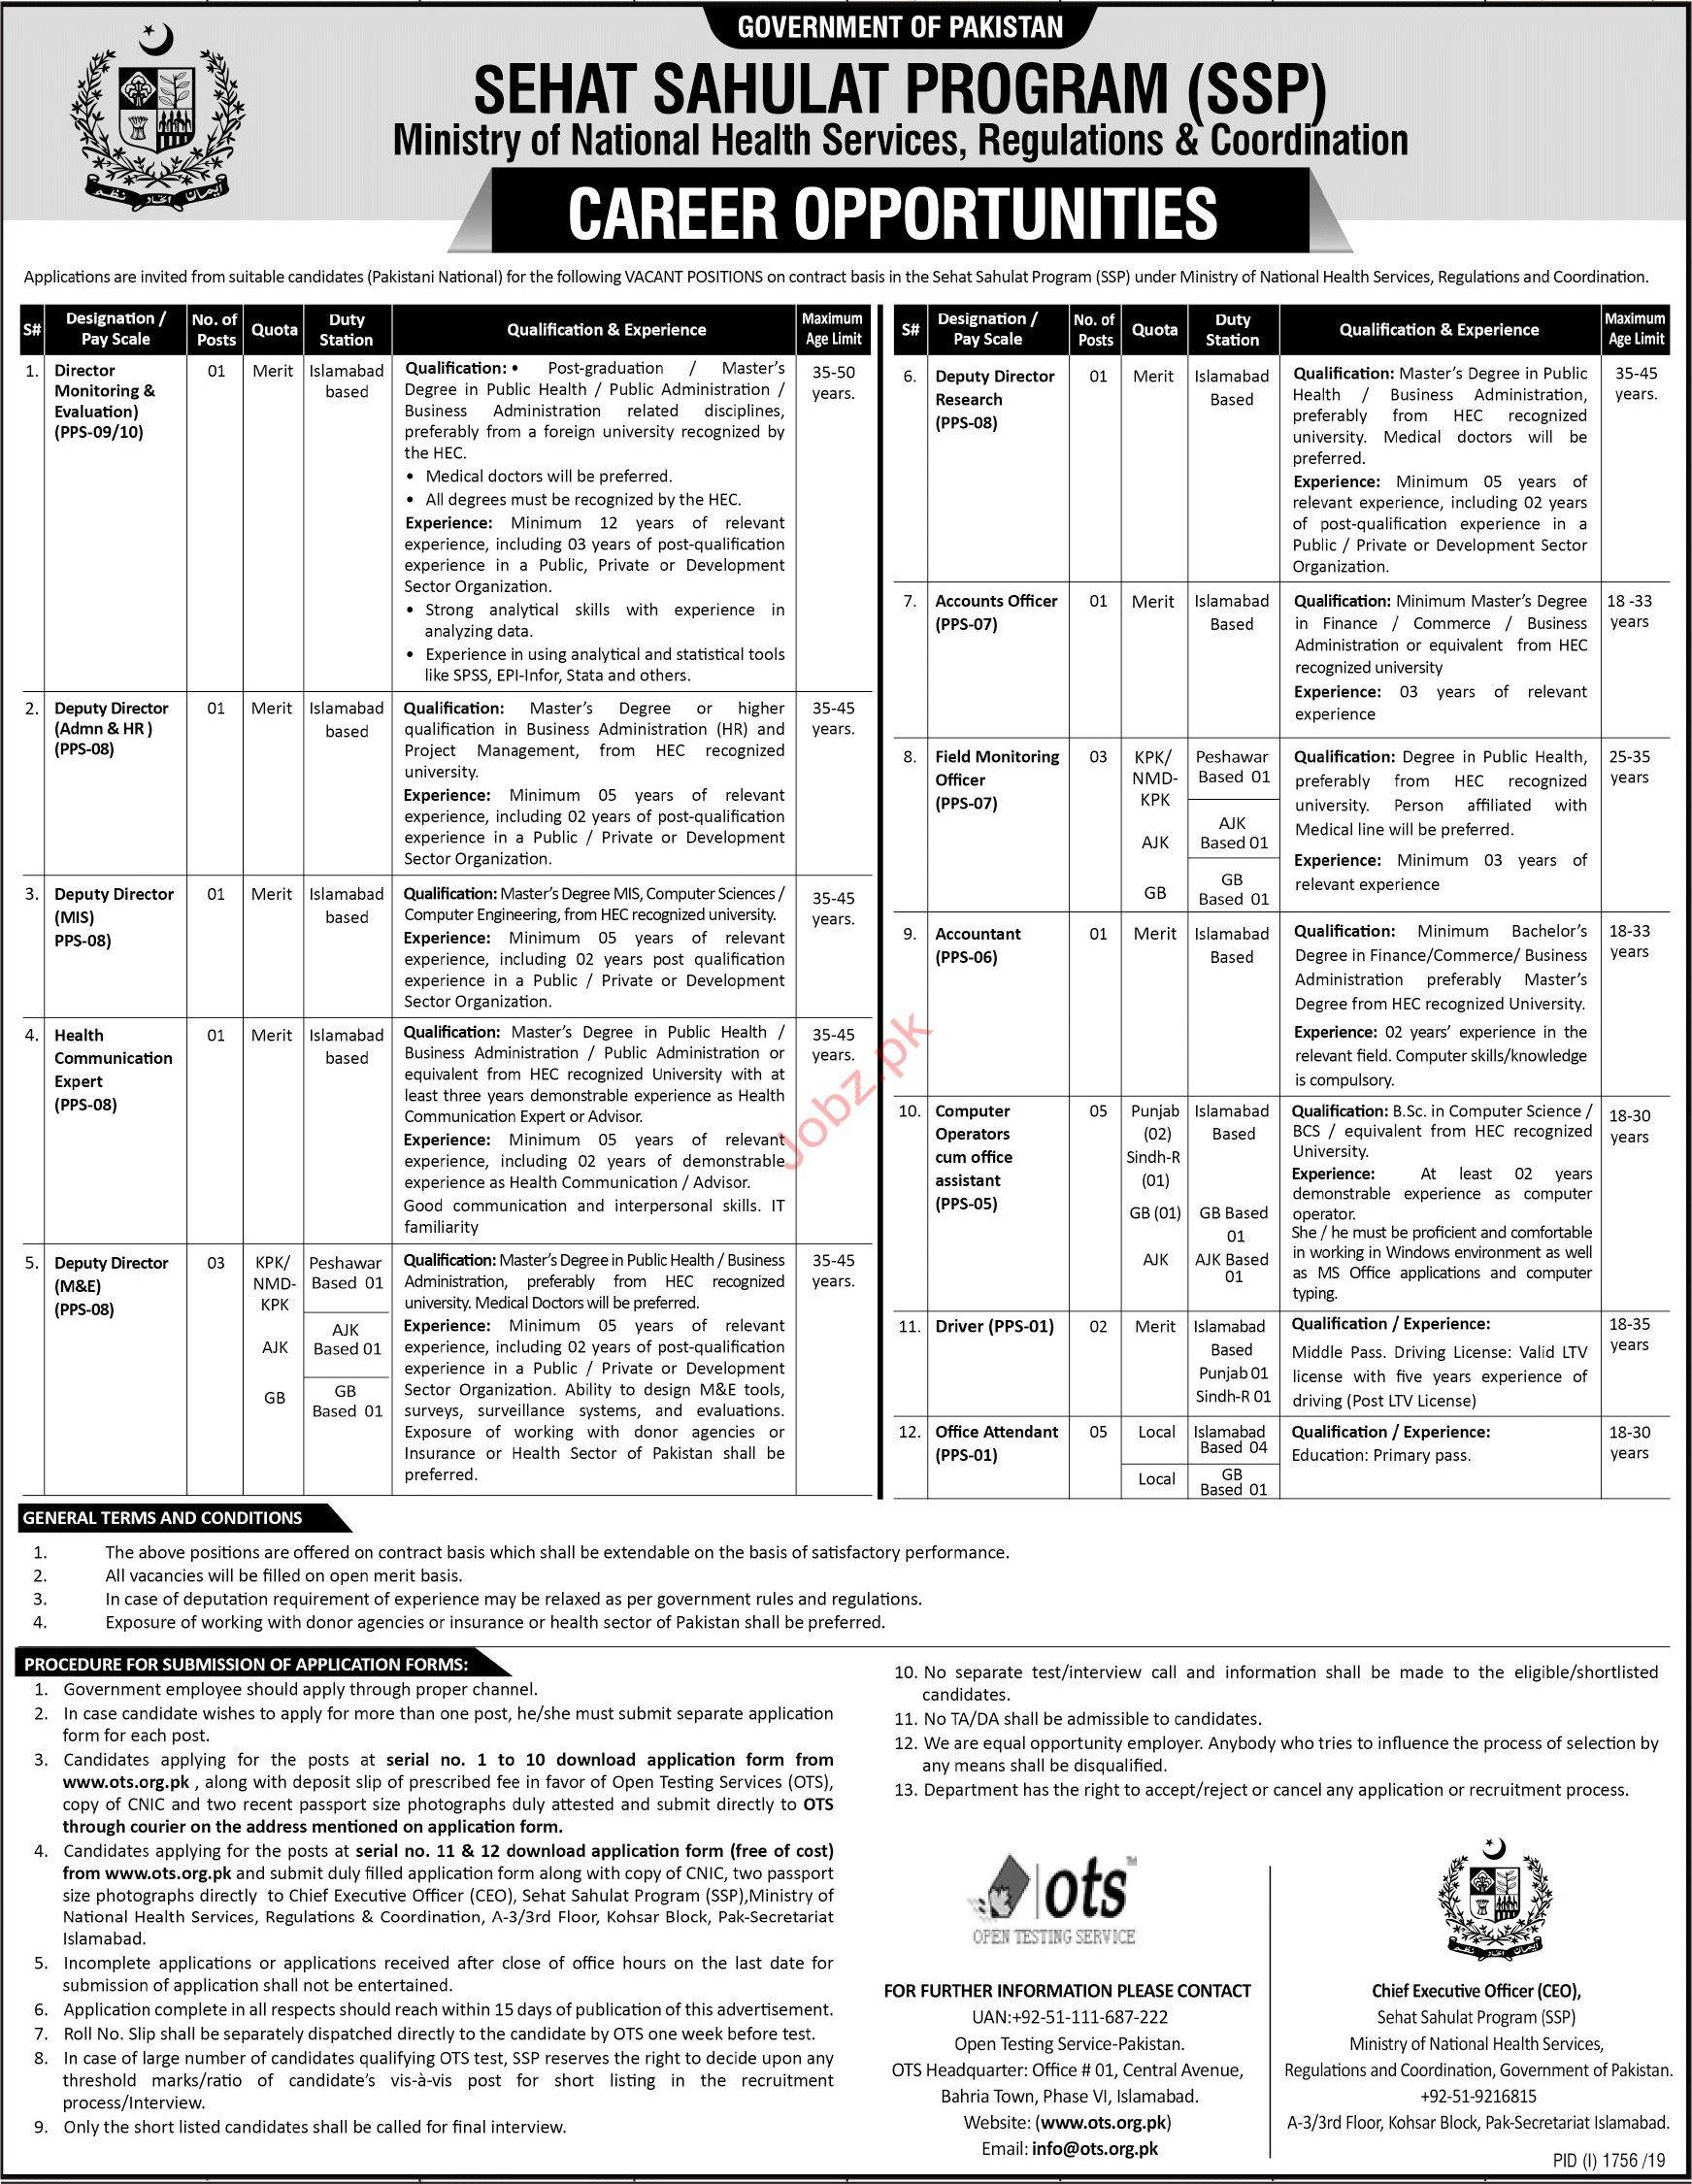 Sehat Saholat Program Govt Of Pakistan OTS Jobs